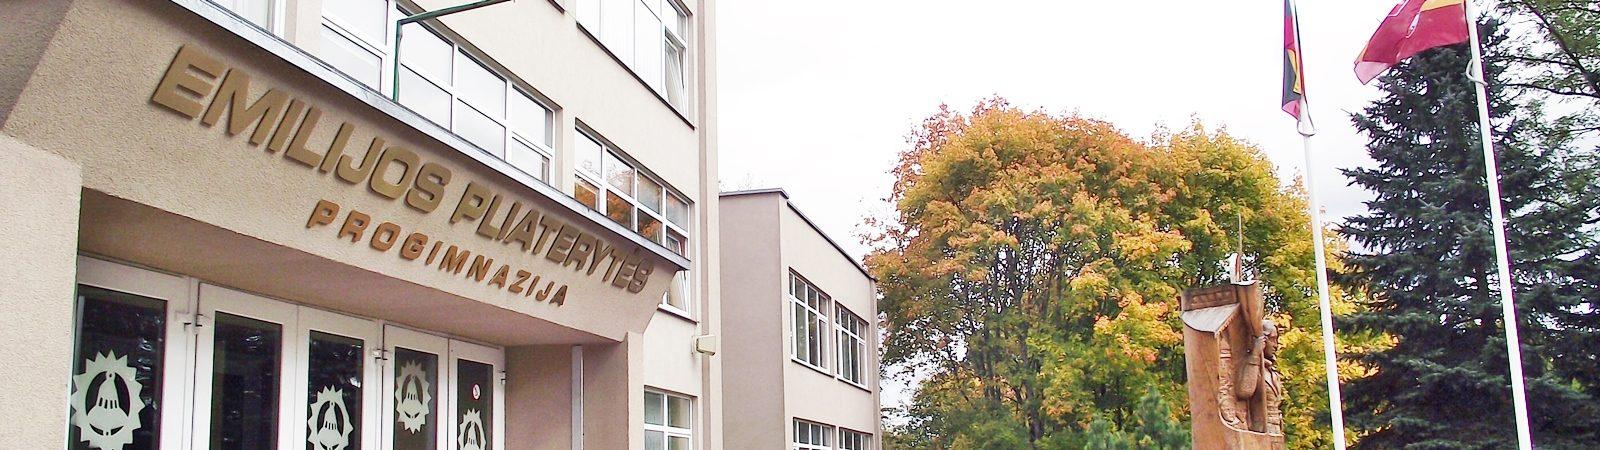 Vilniaus Emilijos Pliaterytės progimnazija